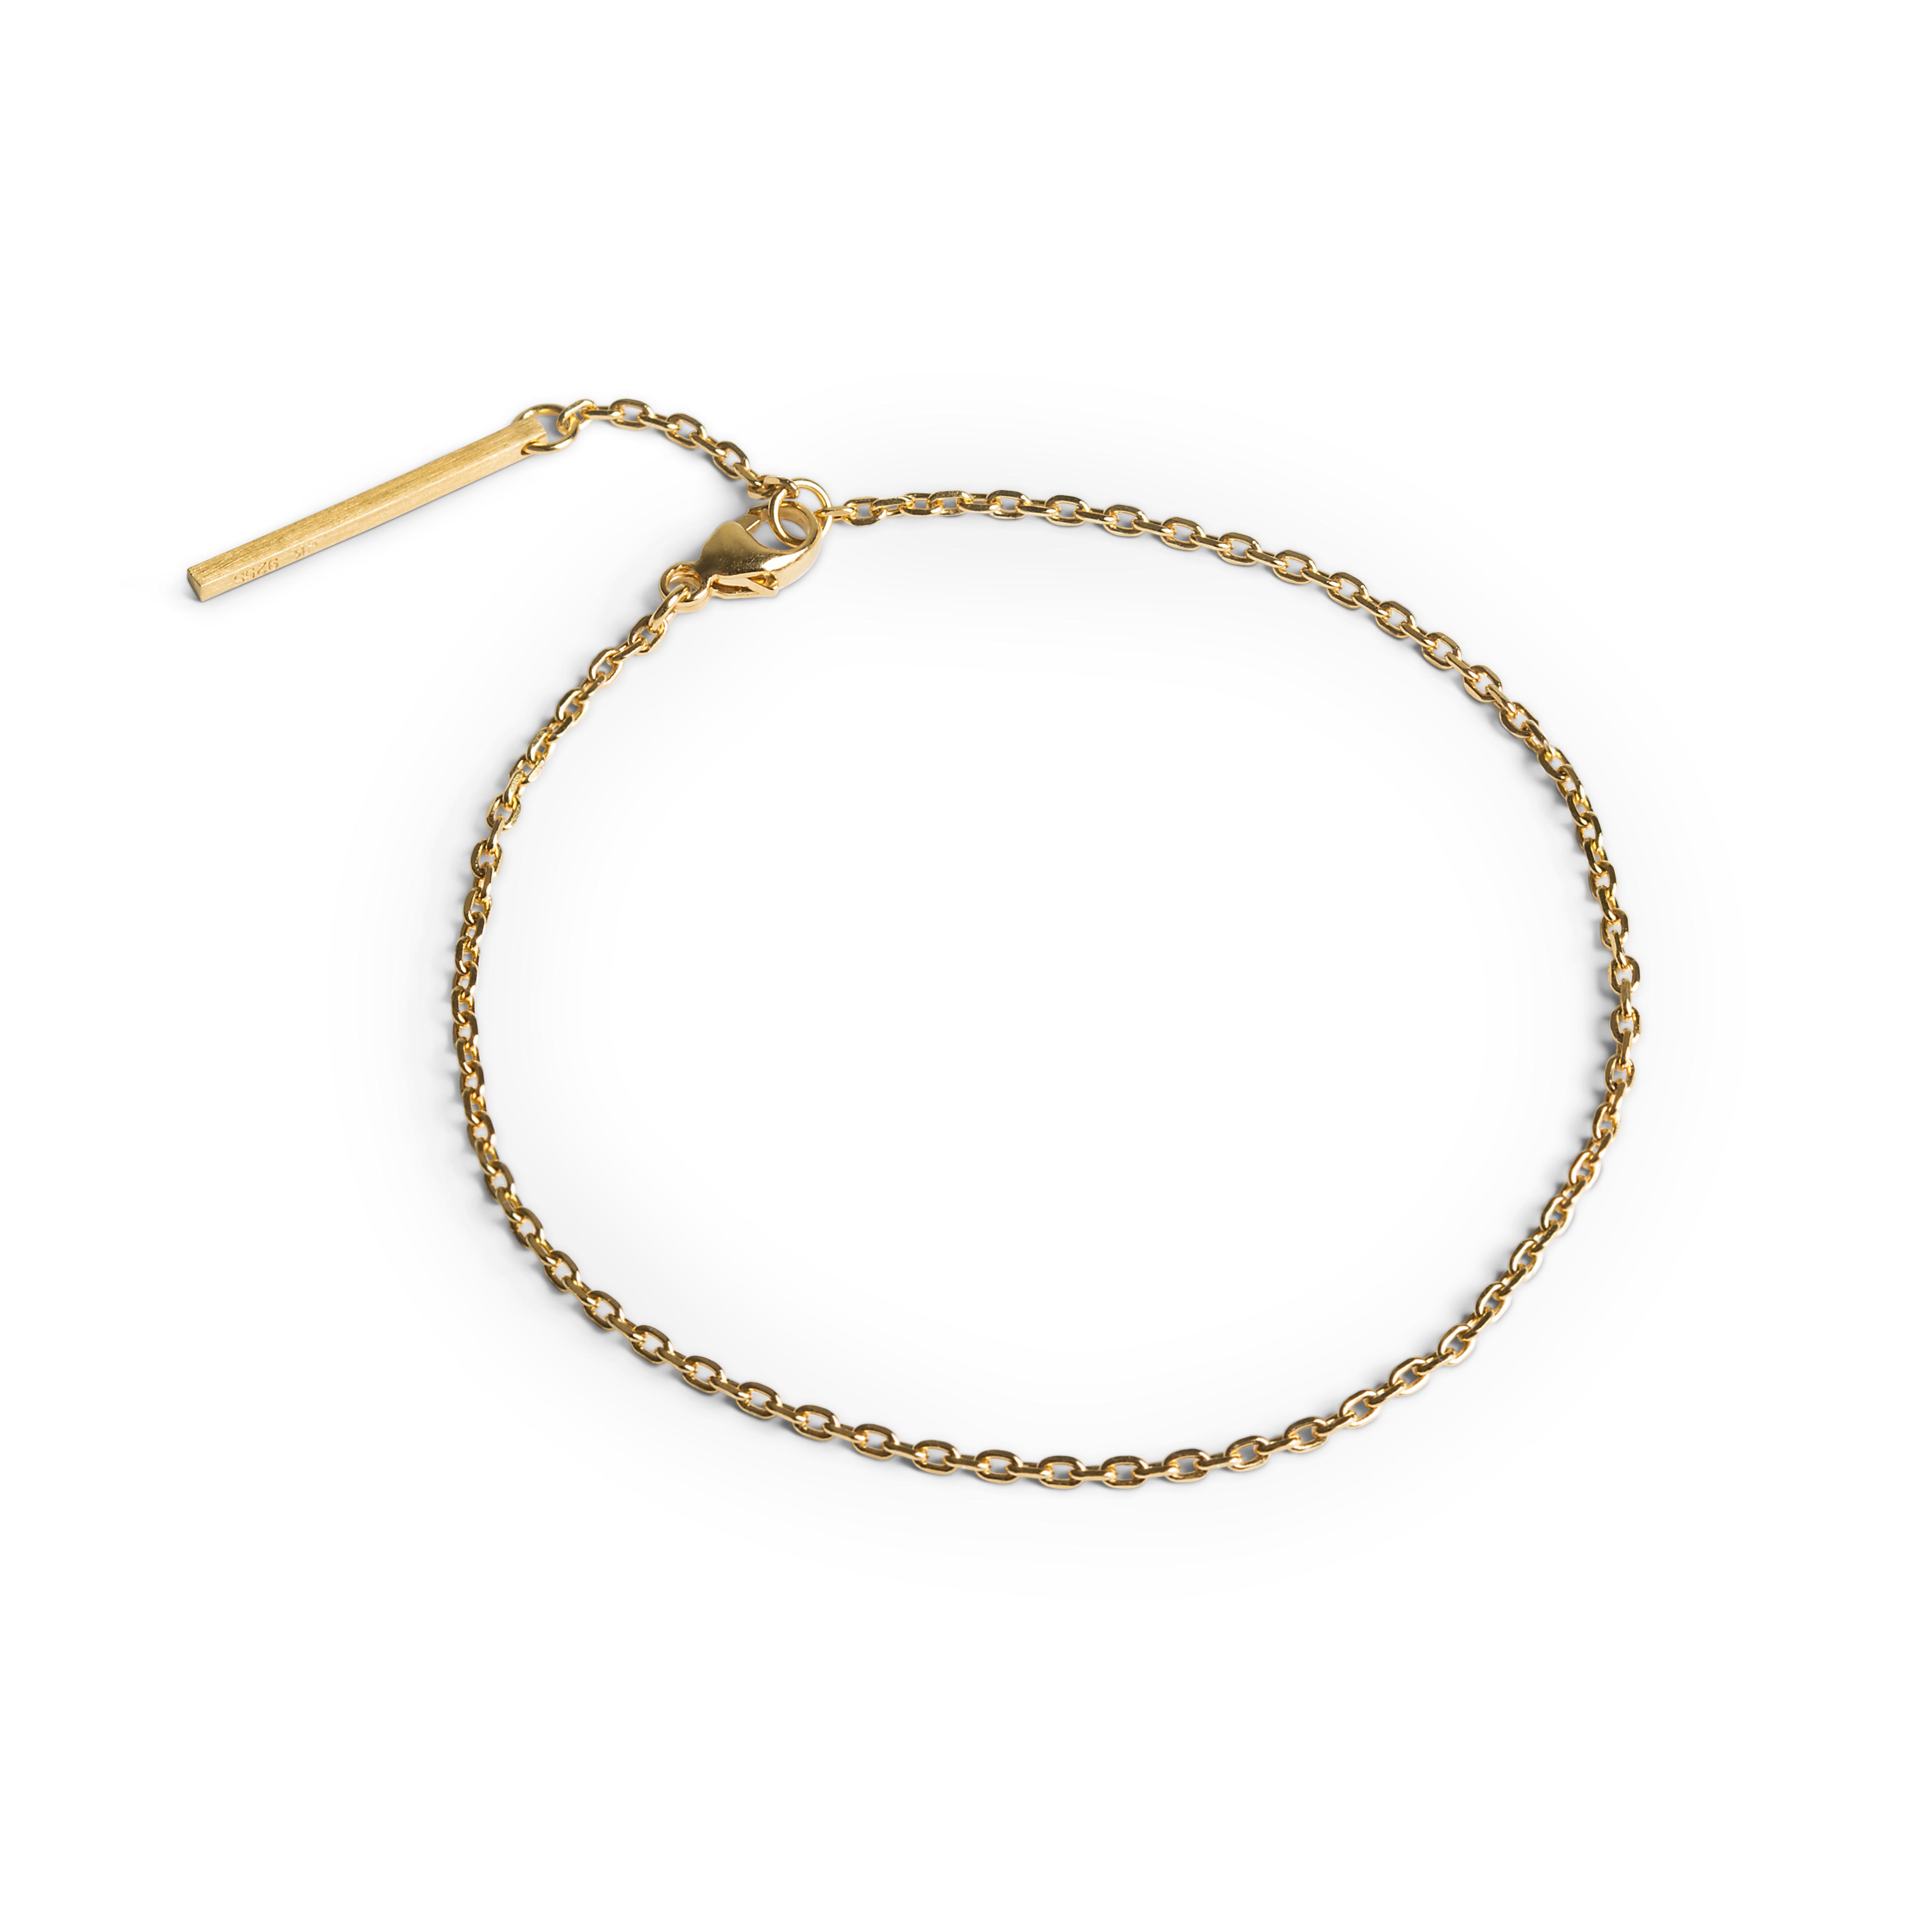 Jane Kønig Anchor Chain armbånd, guld